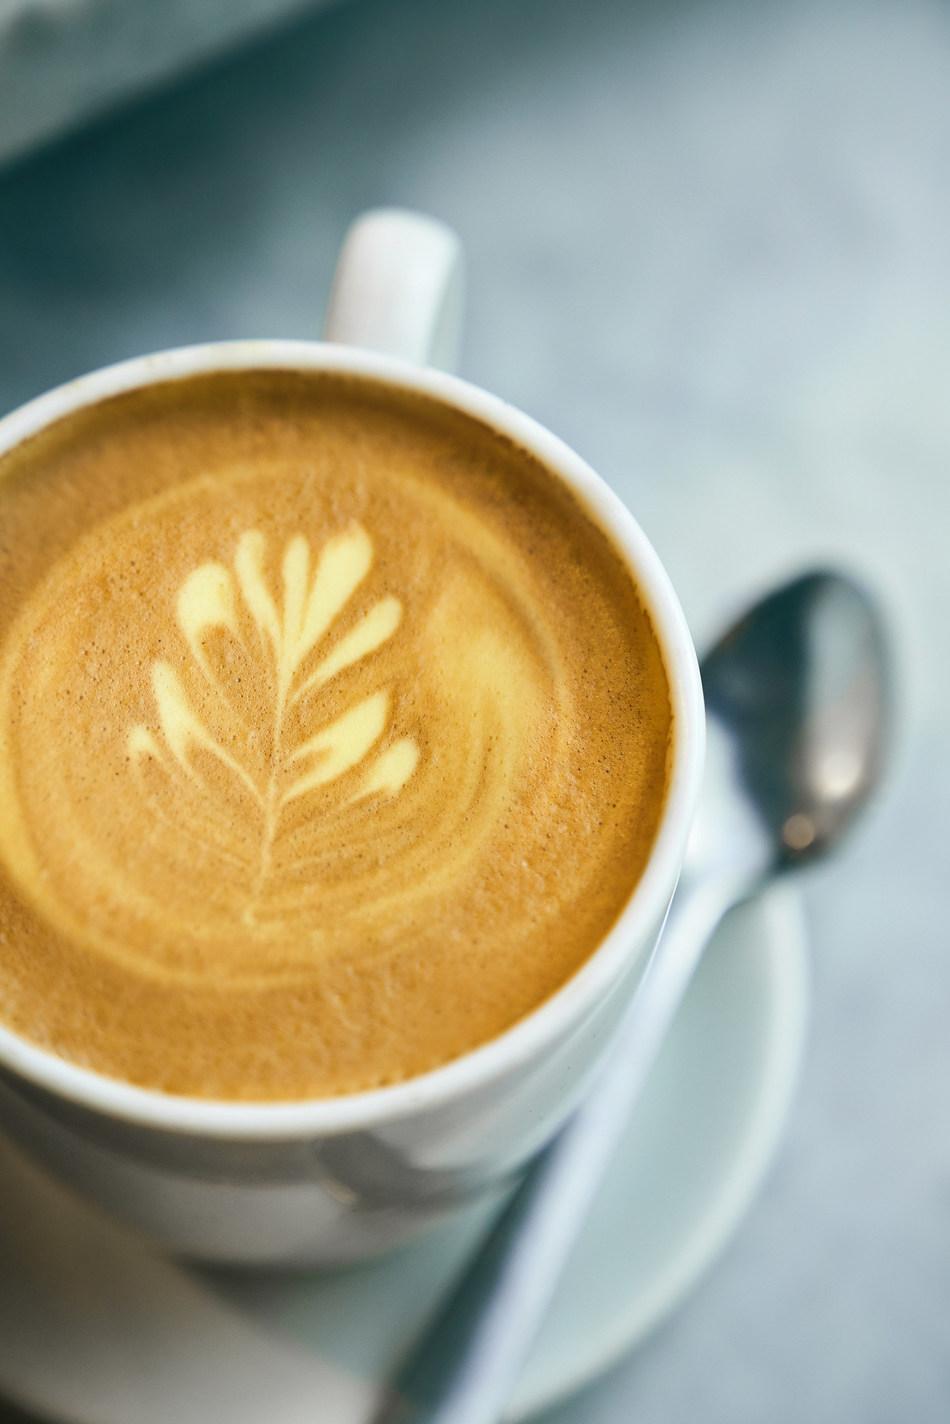 (PRNewsfoto/Peet's Coffee & Tea, Inc.)